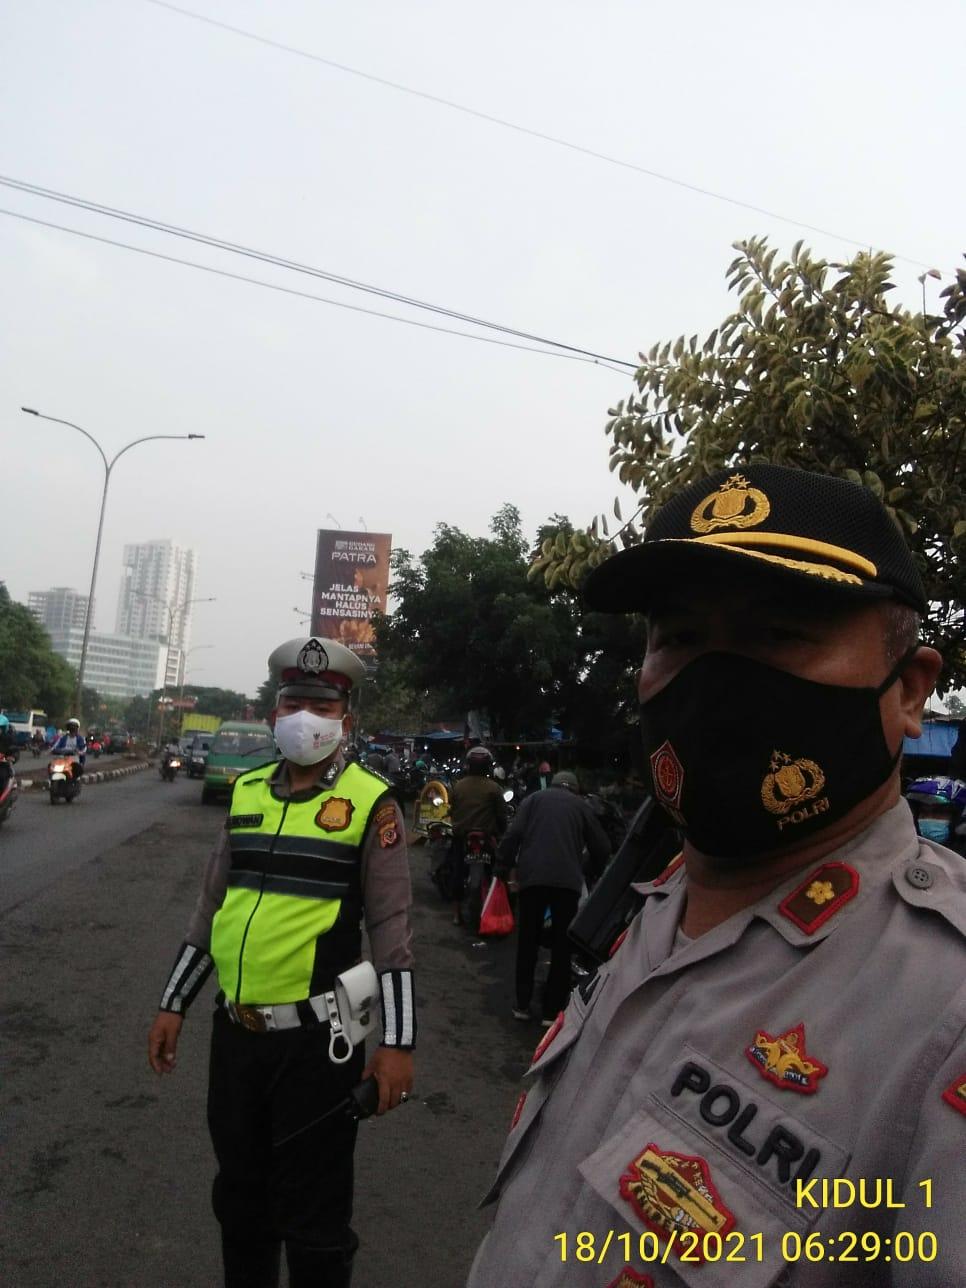 Antisipasi Kemacetan Jajaran Polsek Bandung Kidul Polrestabes Bandung Giat Yanmas Pagi